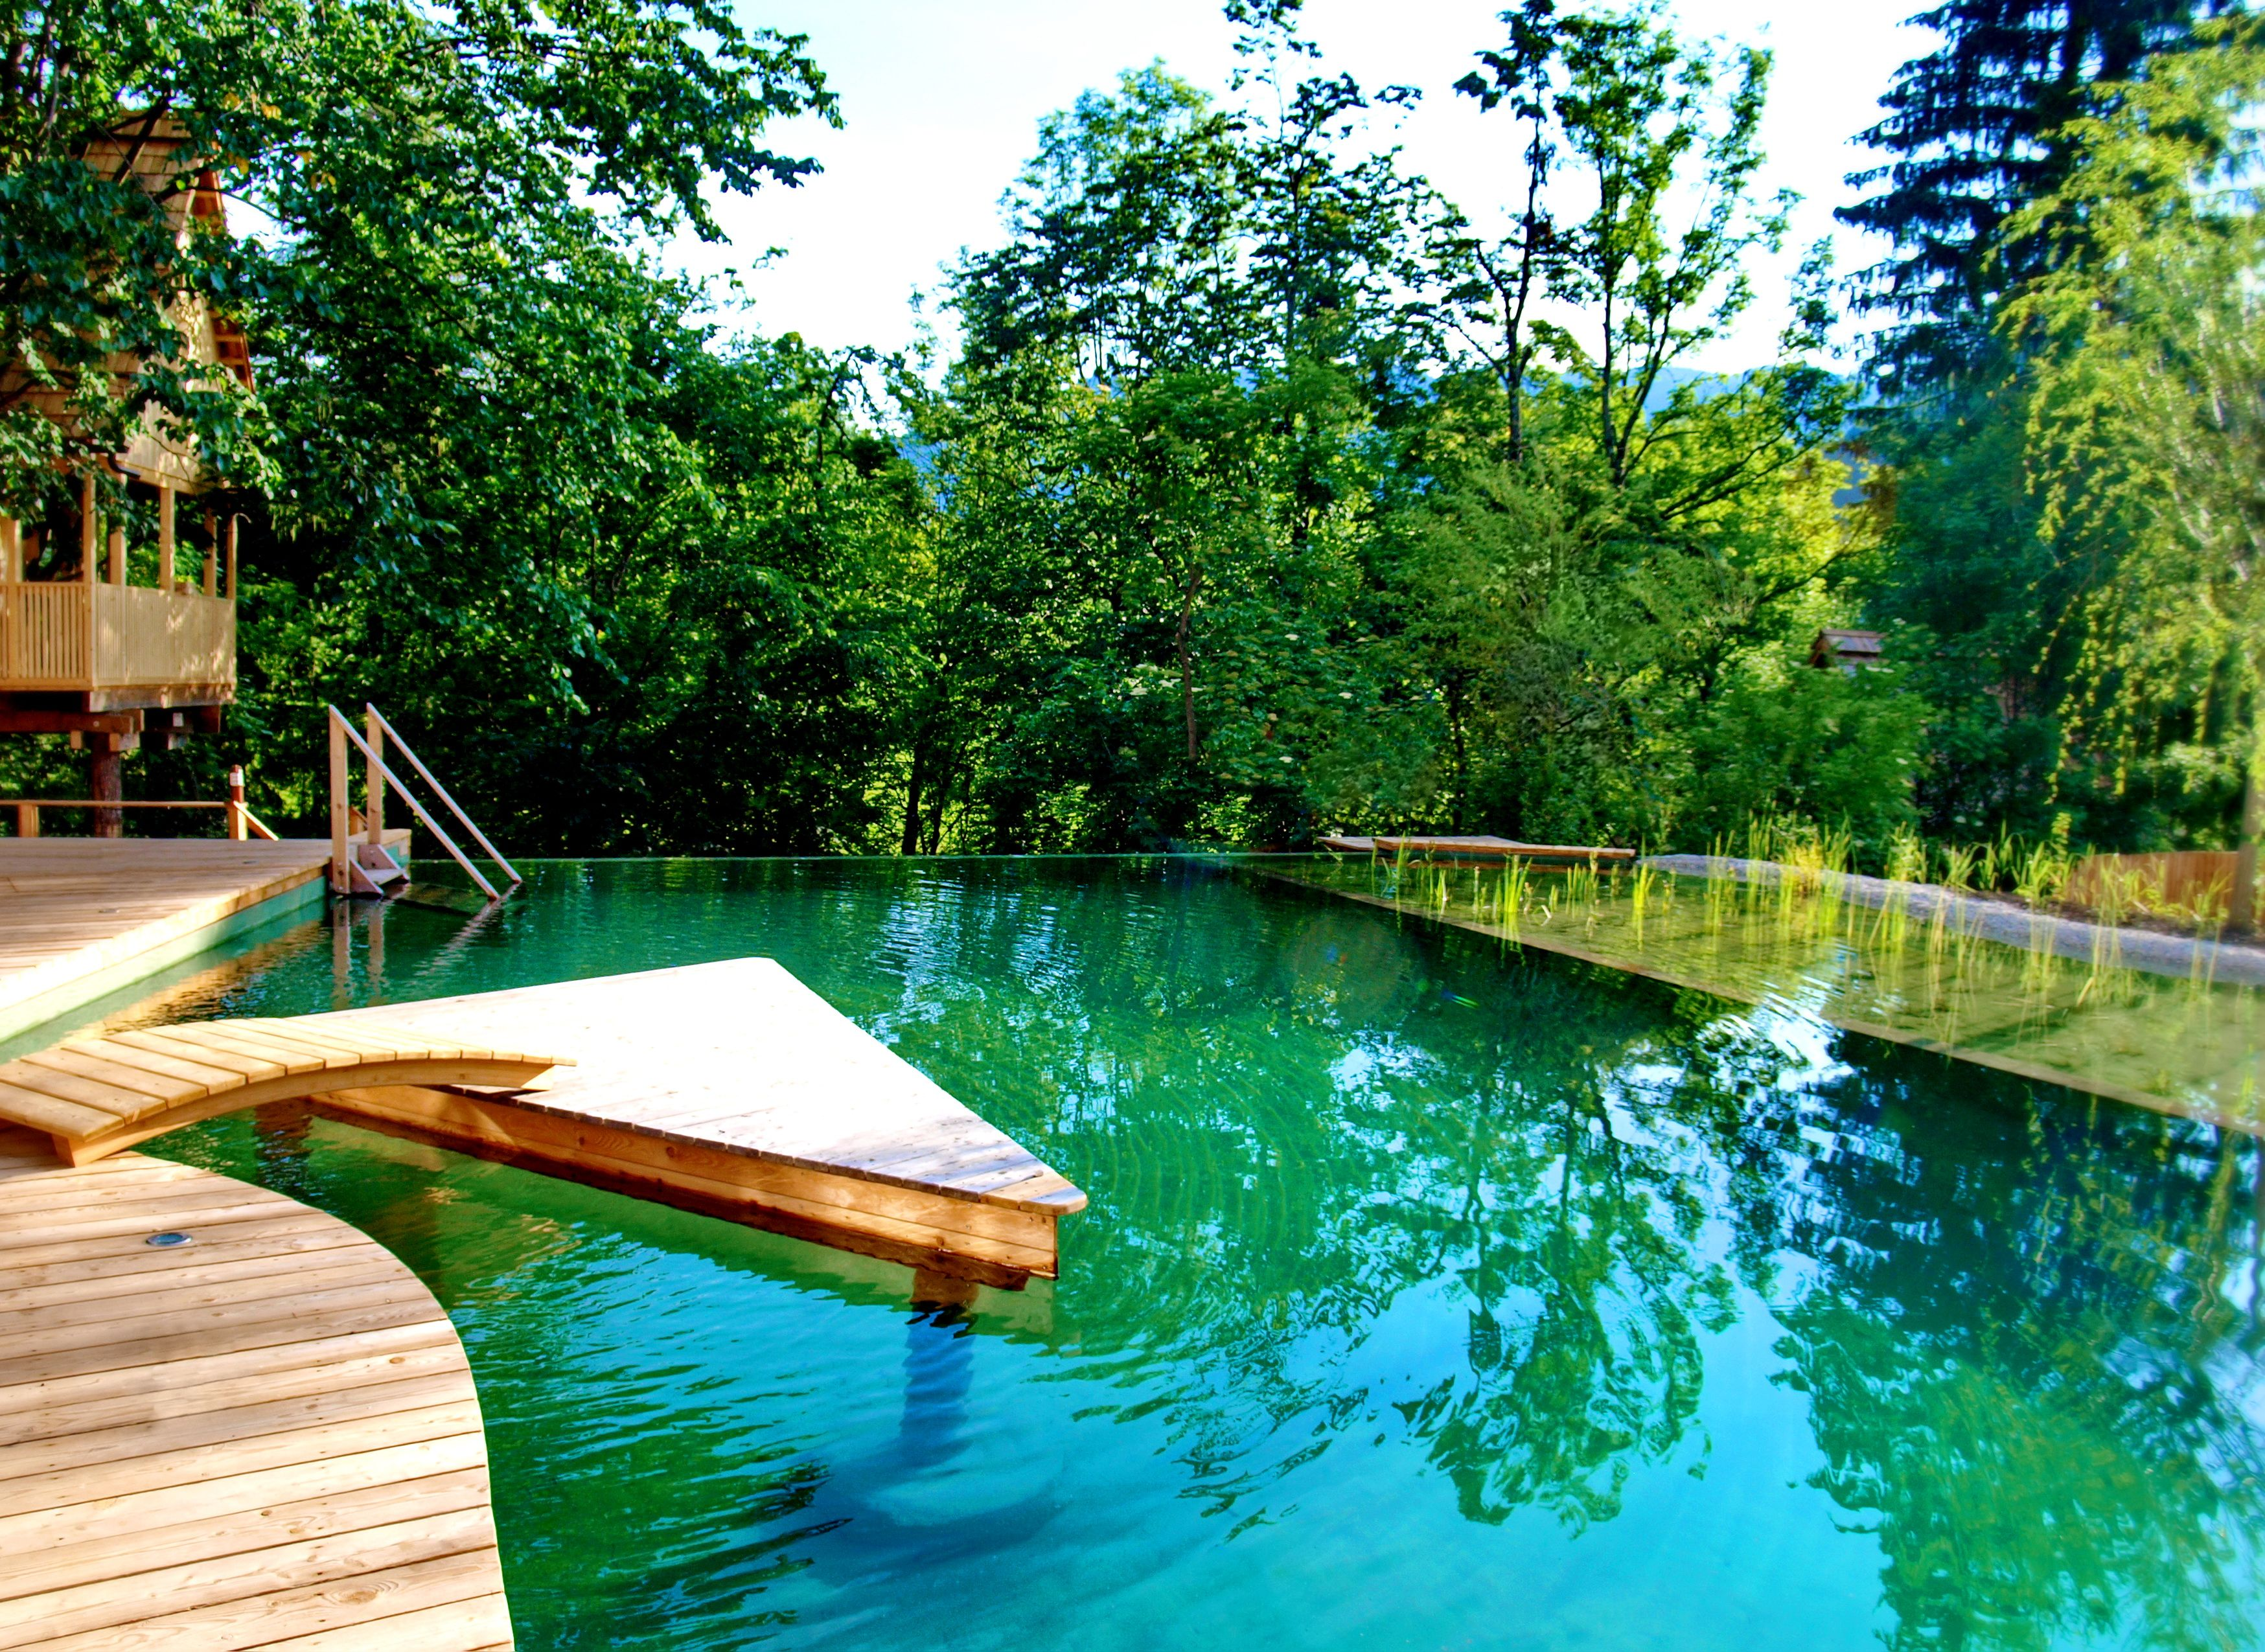 garden village bled glamping resort slovenia the natural